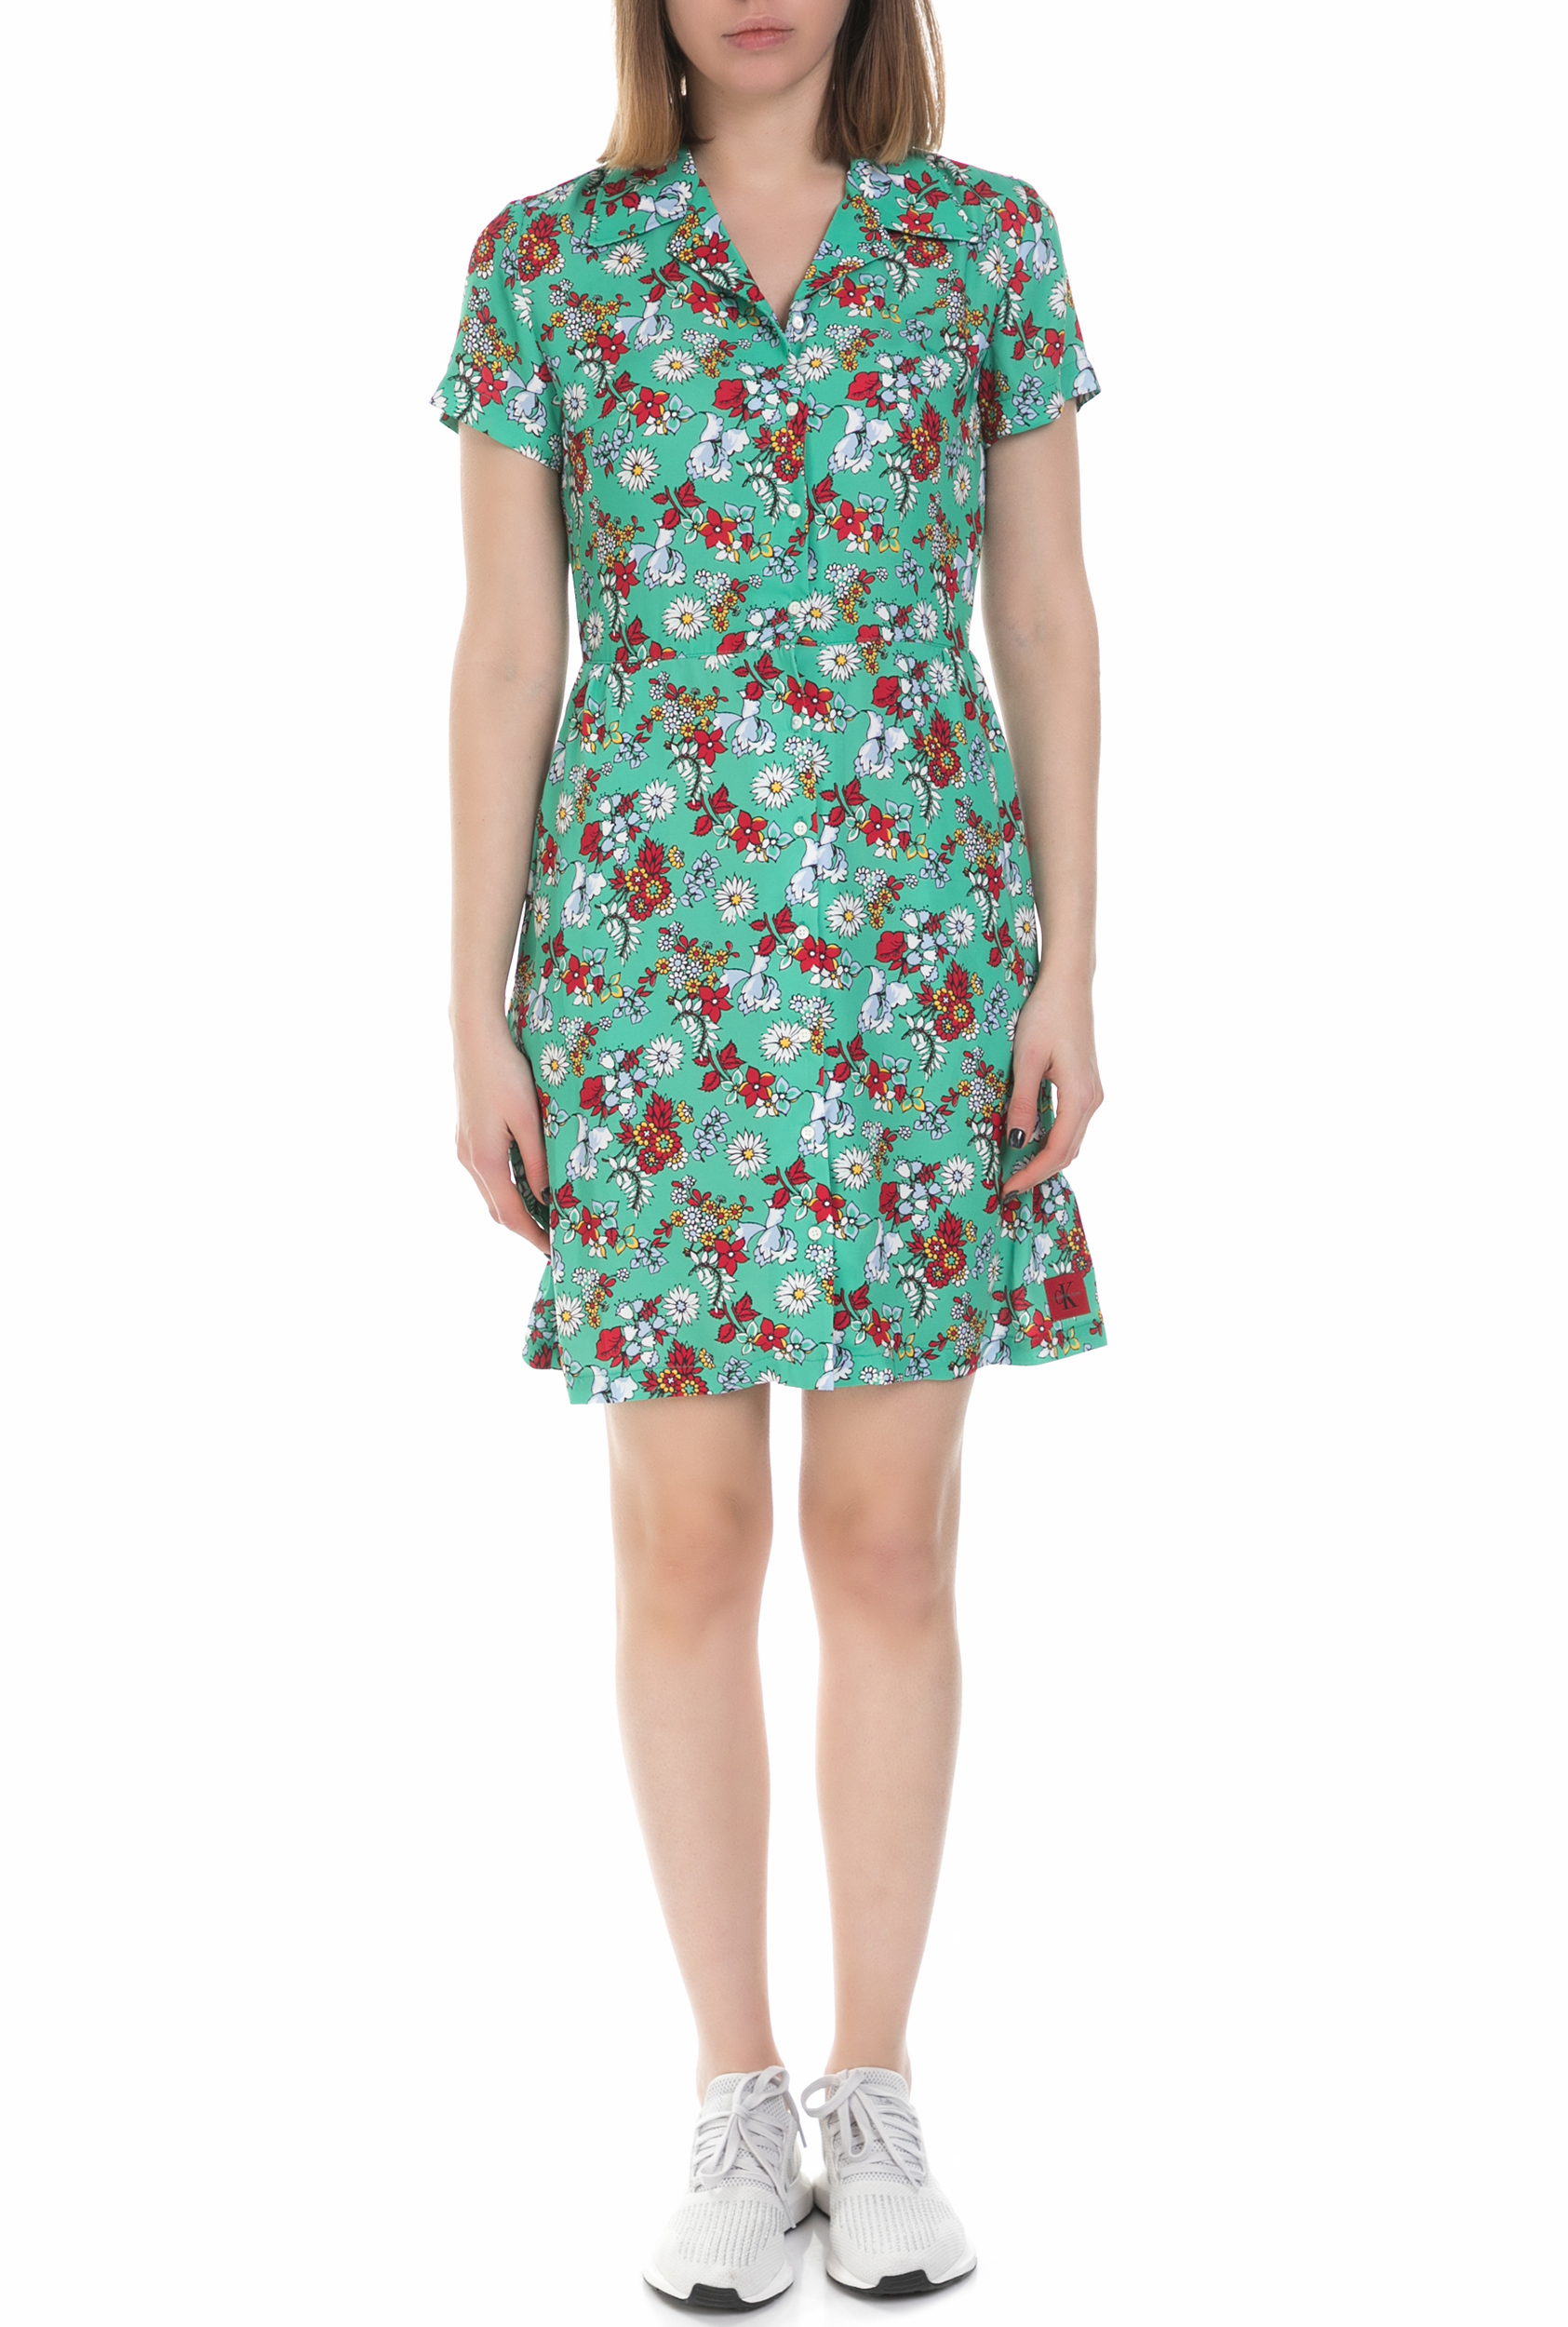 8aca0599af6 CALVIN KLEIN JEANS - Γυναικείο μίνι φλοράλ φόρεμα Calvin Klein Jeans πράσινο